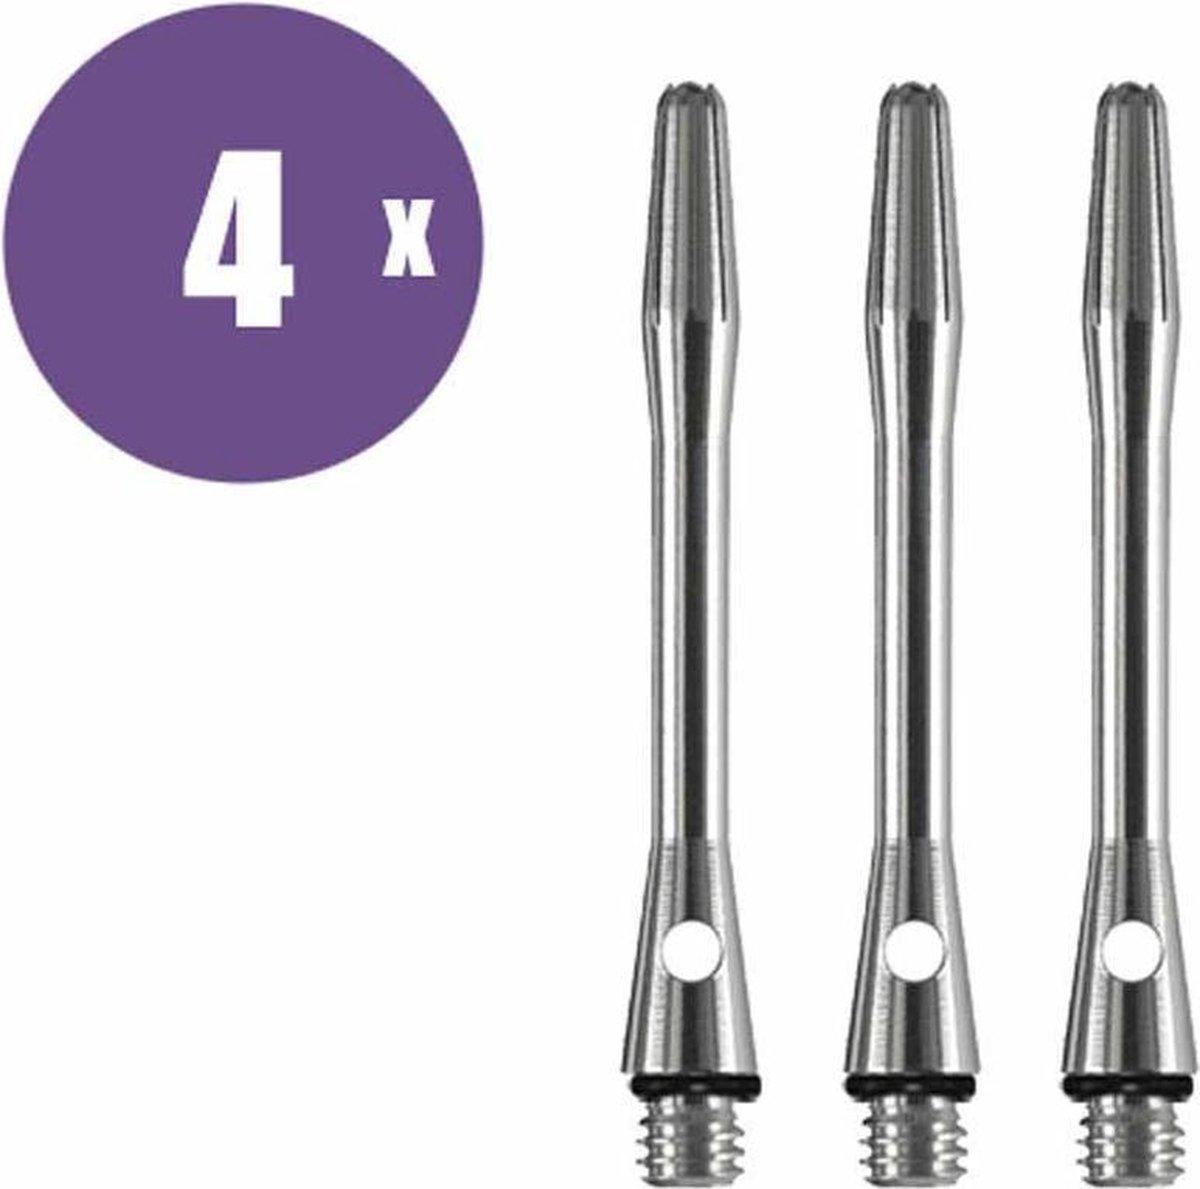 ABC Darts Shafts - Aluminium Naturel - In Between - 4 sets dartshafts